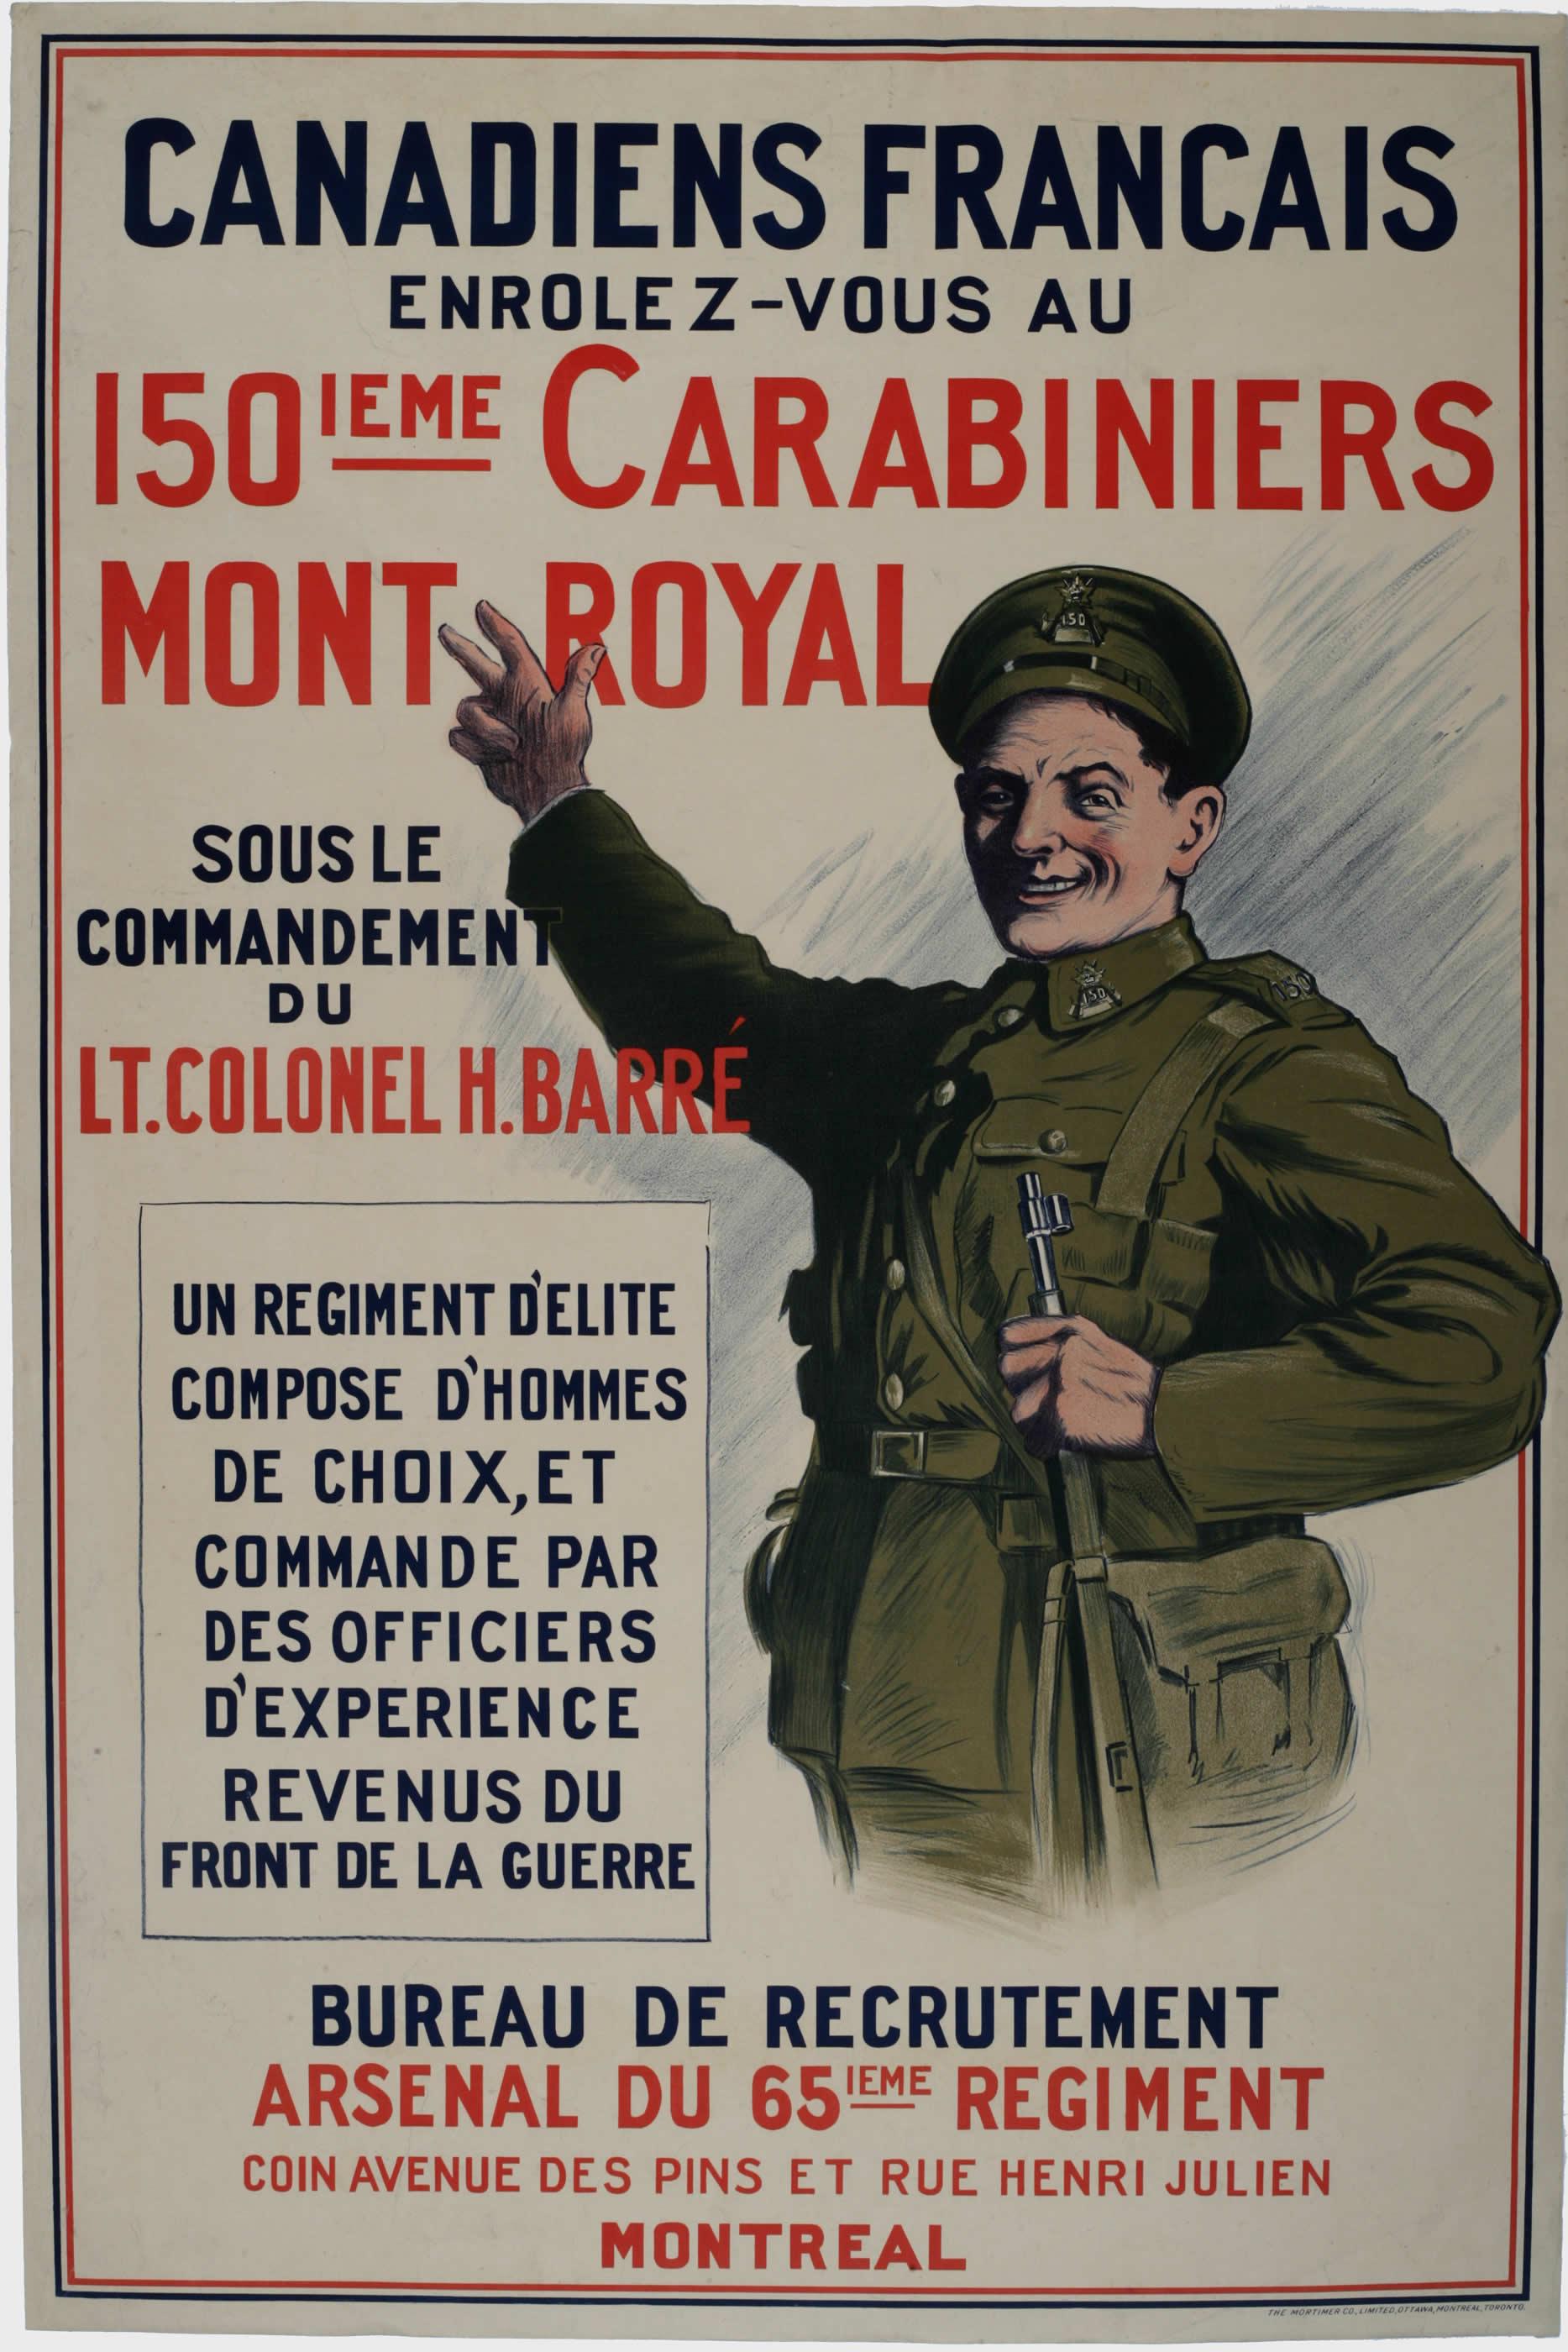 <i> 150<sup>e</sup> Carabinier (150<sup>e</sup> bataillon) </i>